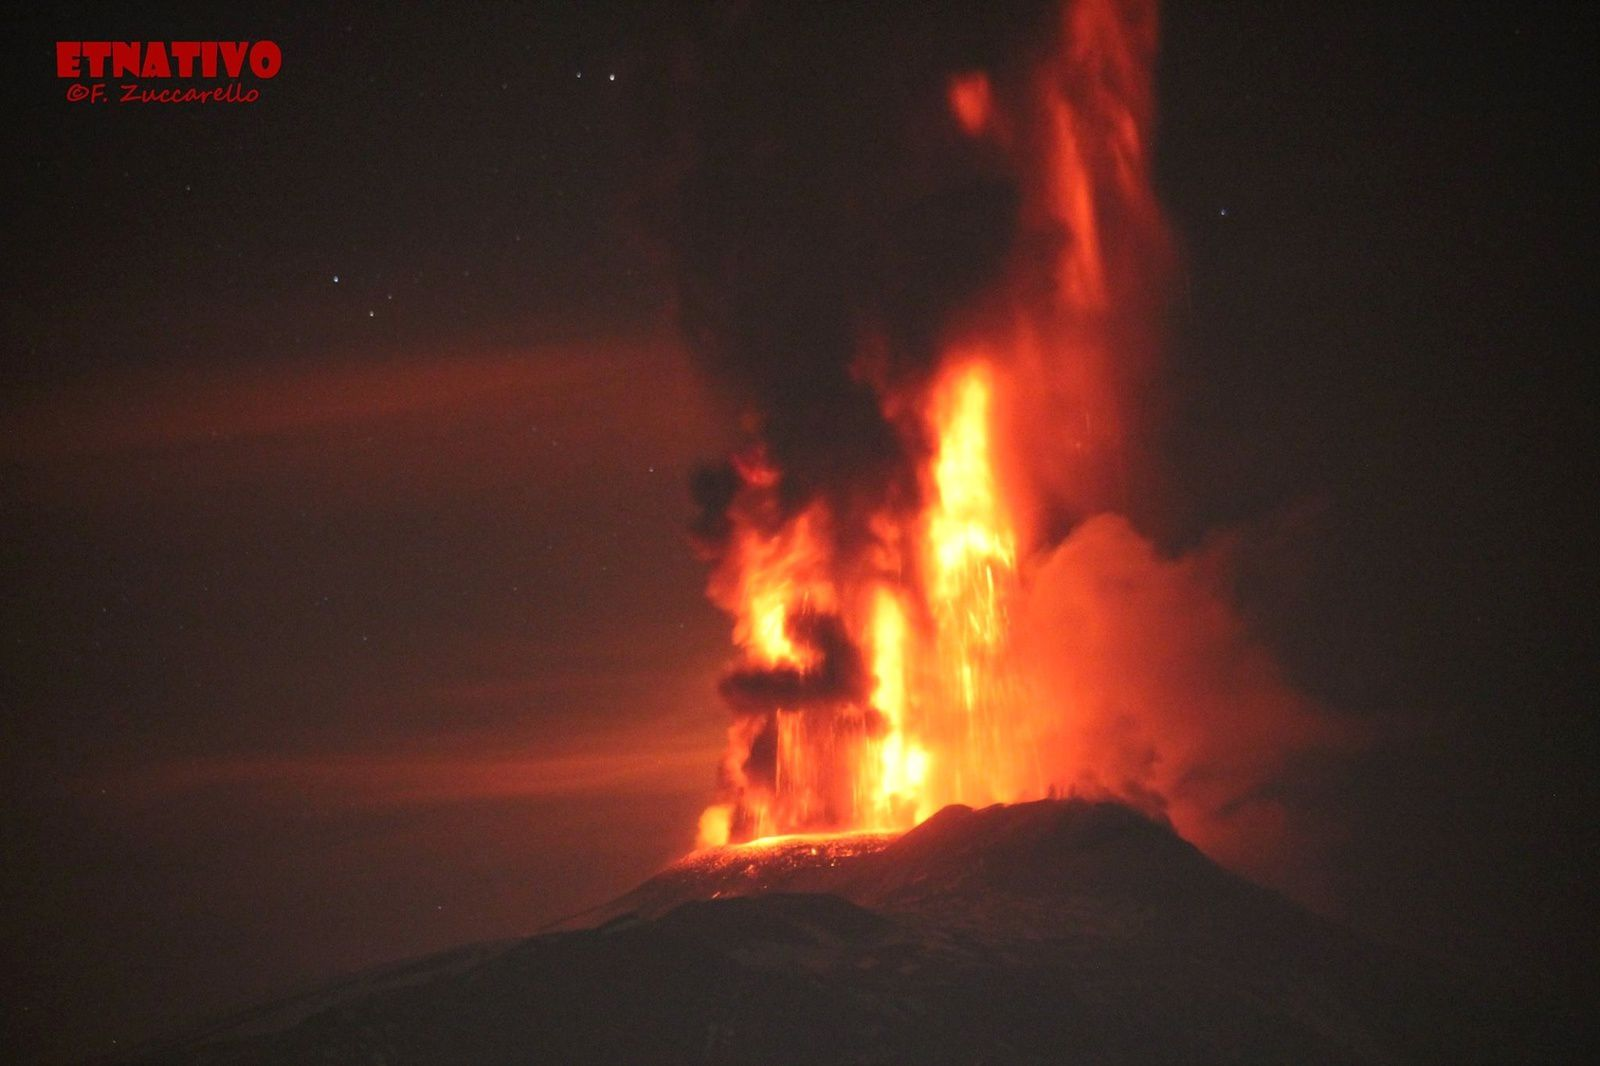 Etna - Voragine  -    paroxysme du 03.12.2015 - photo Fabricio Zucccarello /Etnativo